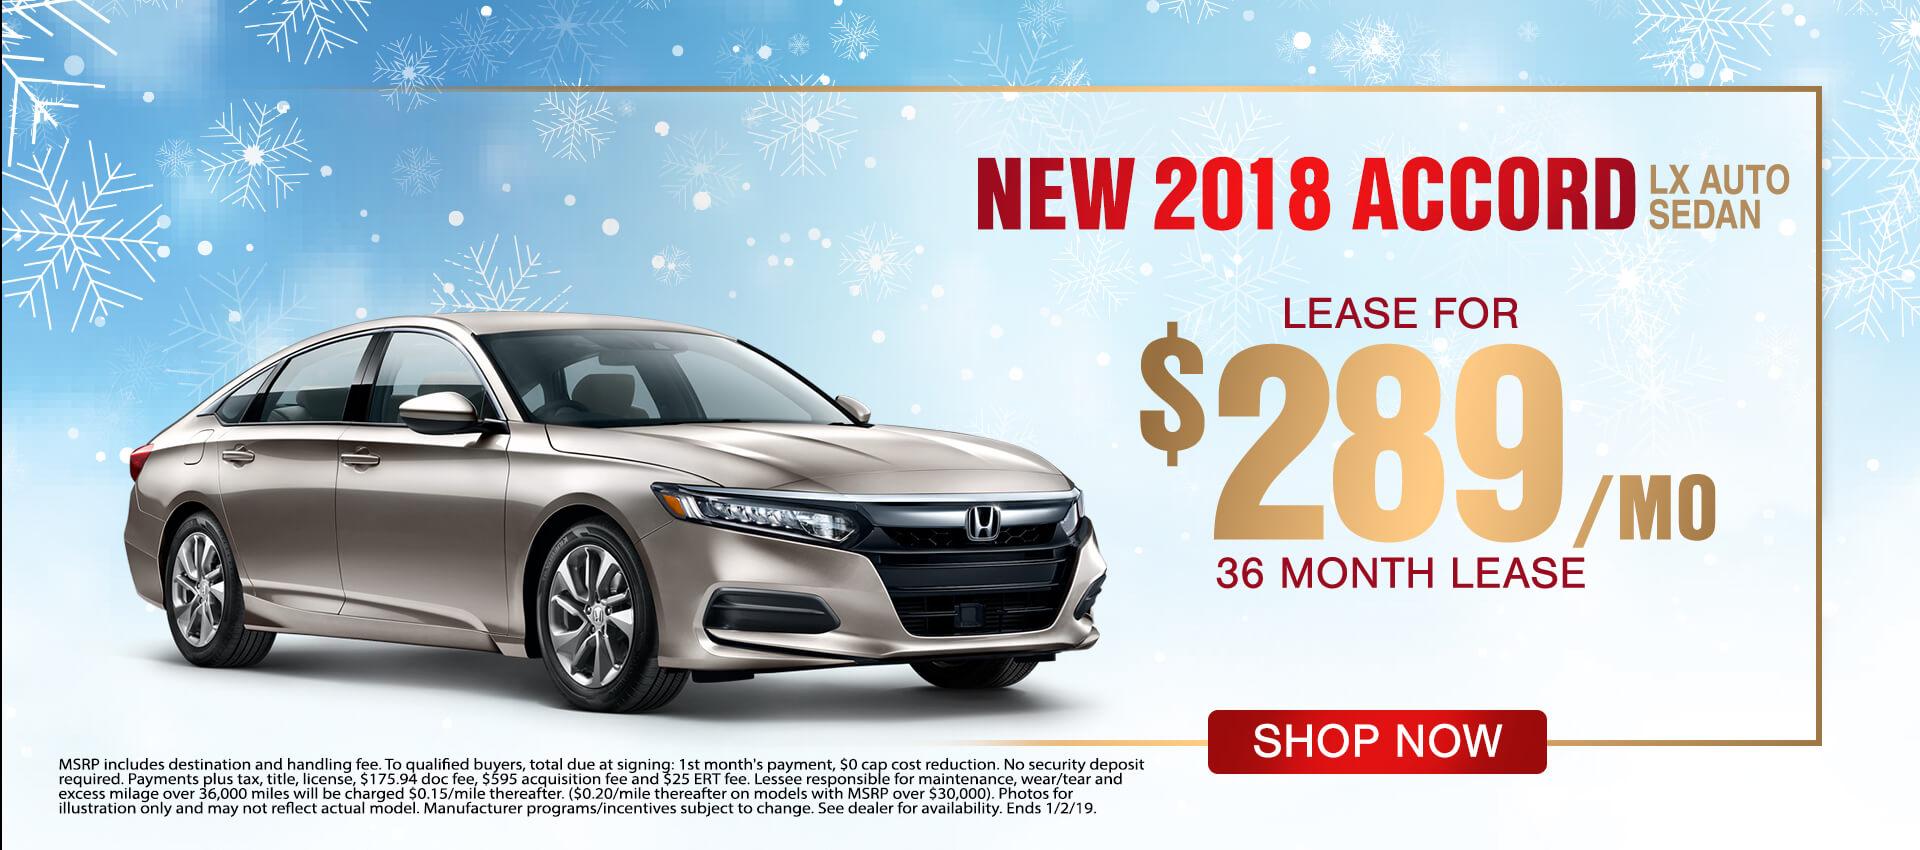 2018 Honda Accord $289